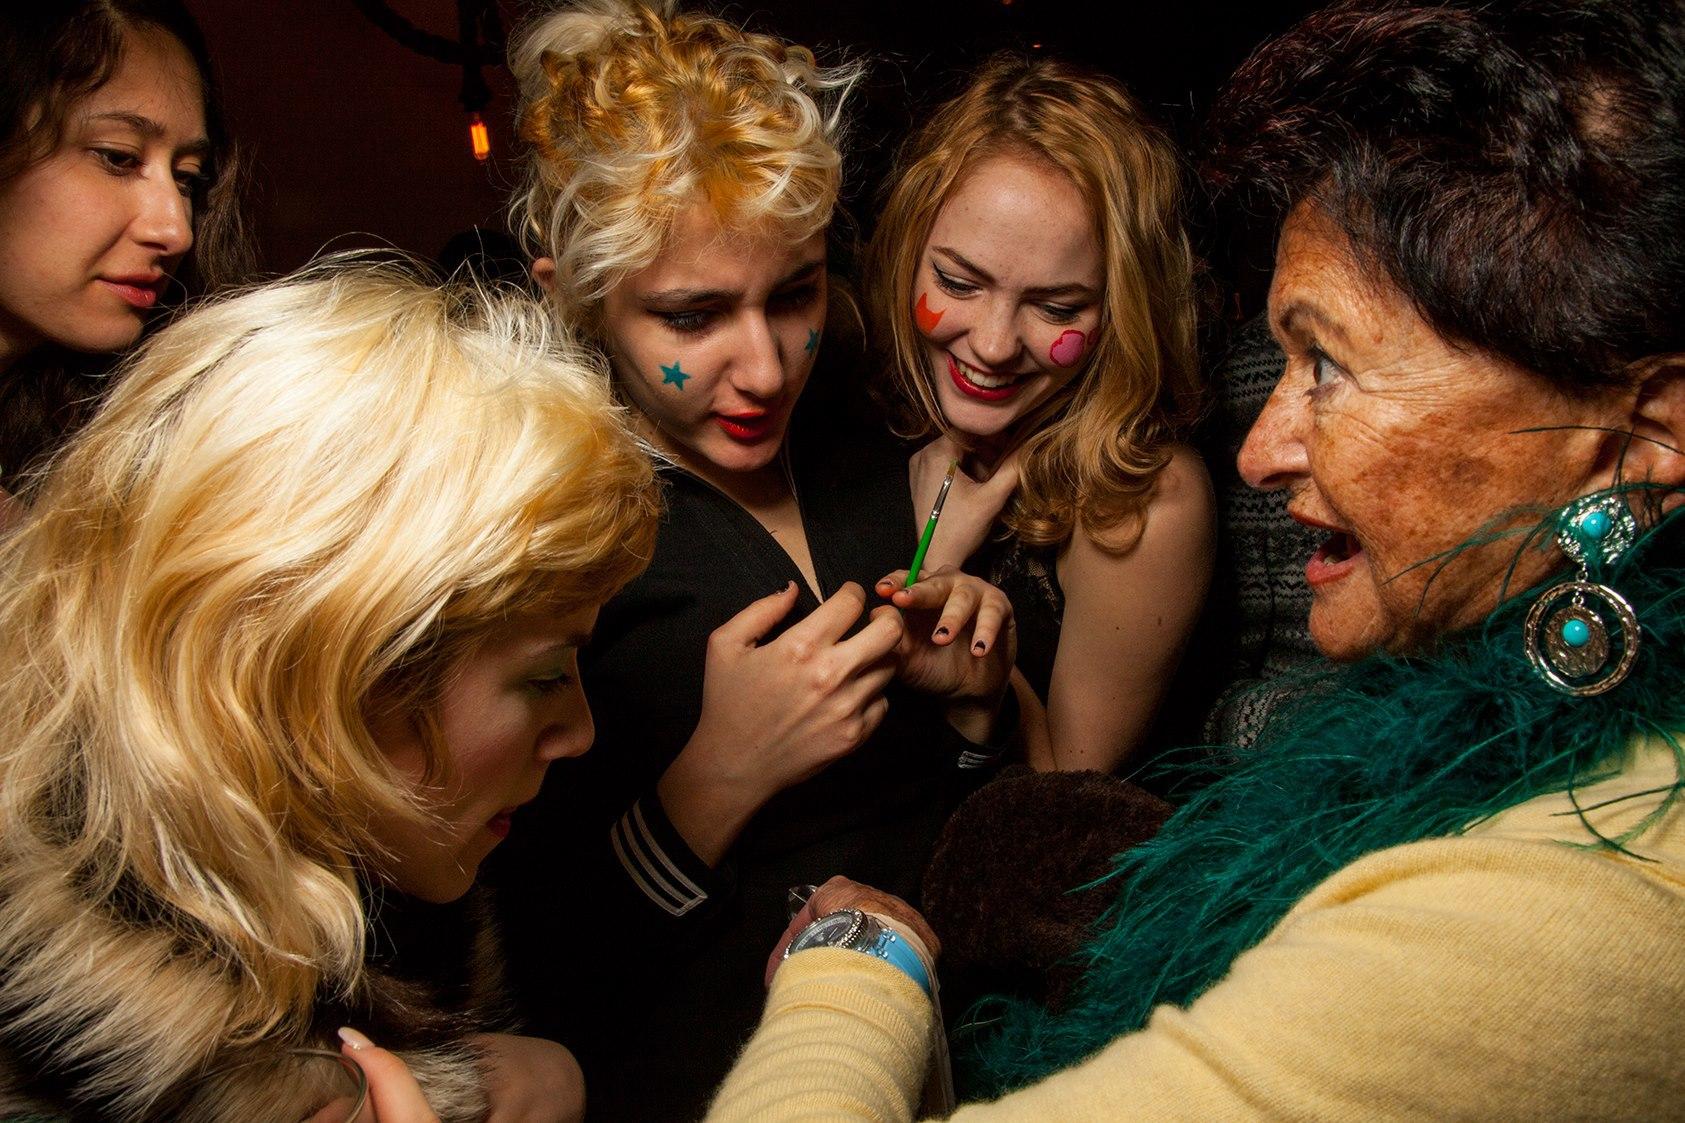 Doris Yaffe Shows off to the Girls